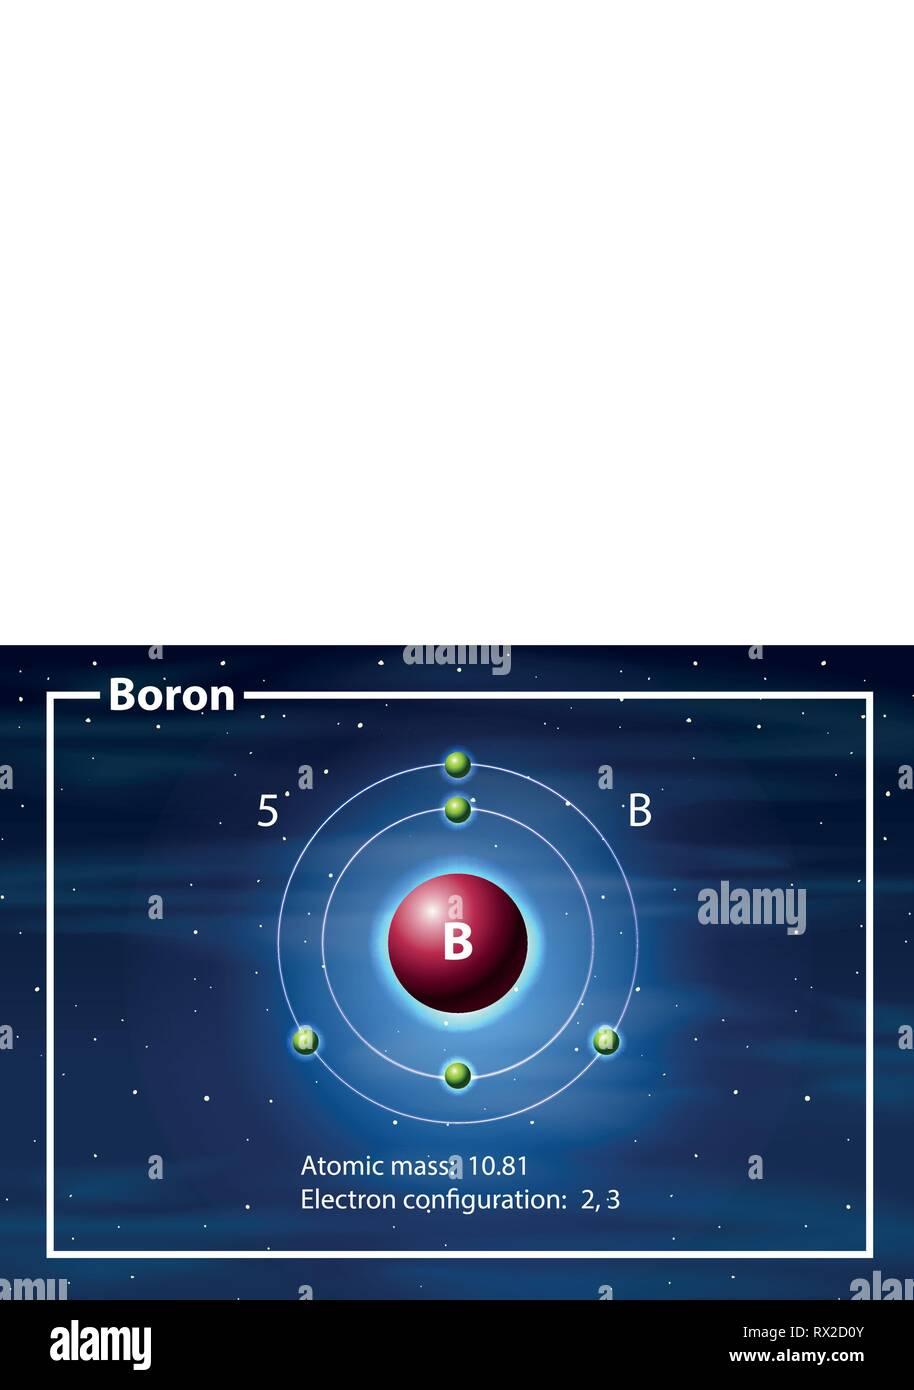 Chemist atom of Borondiagram illustration - Stock Vector